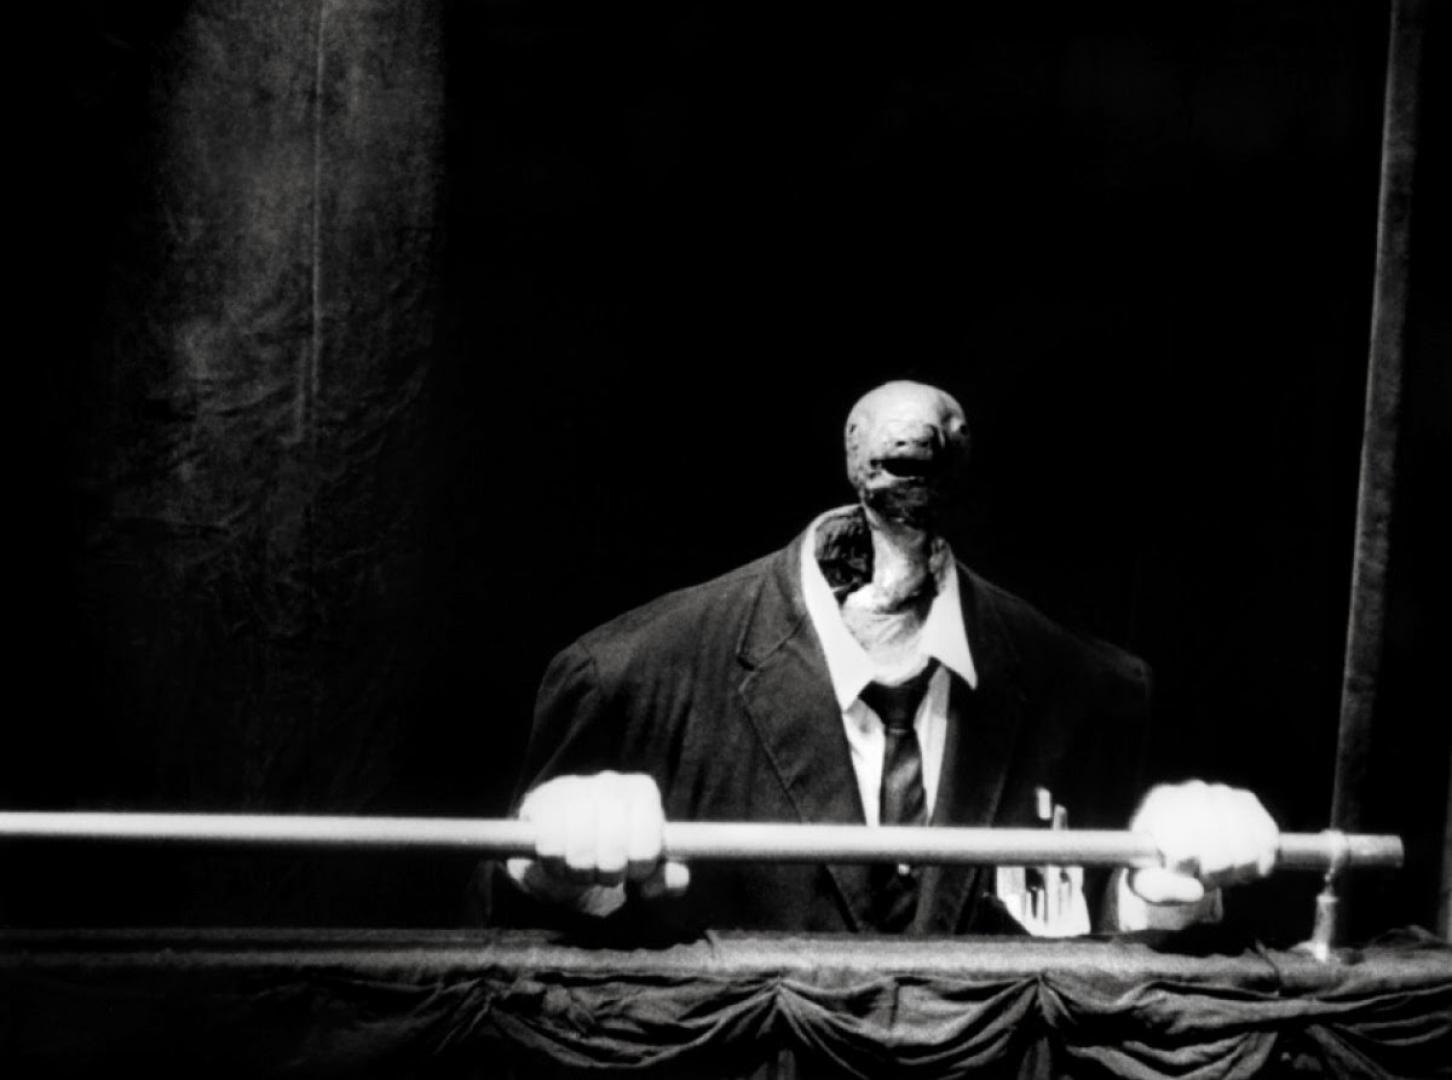 Eraserhead - Radírfej (1977)